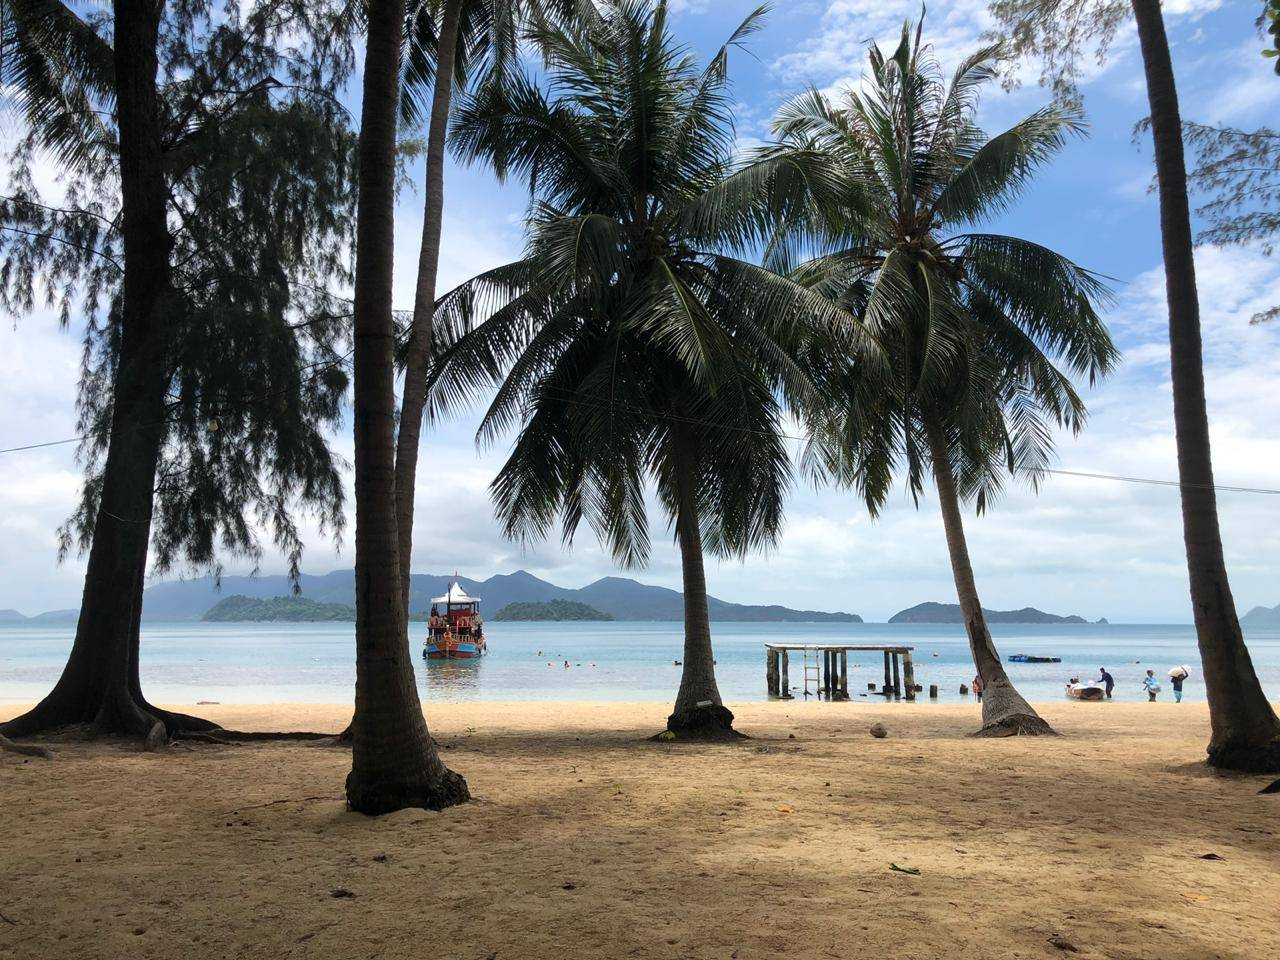 Экскурсия на остров Ко Чанг